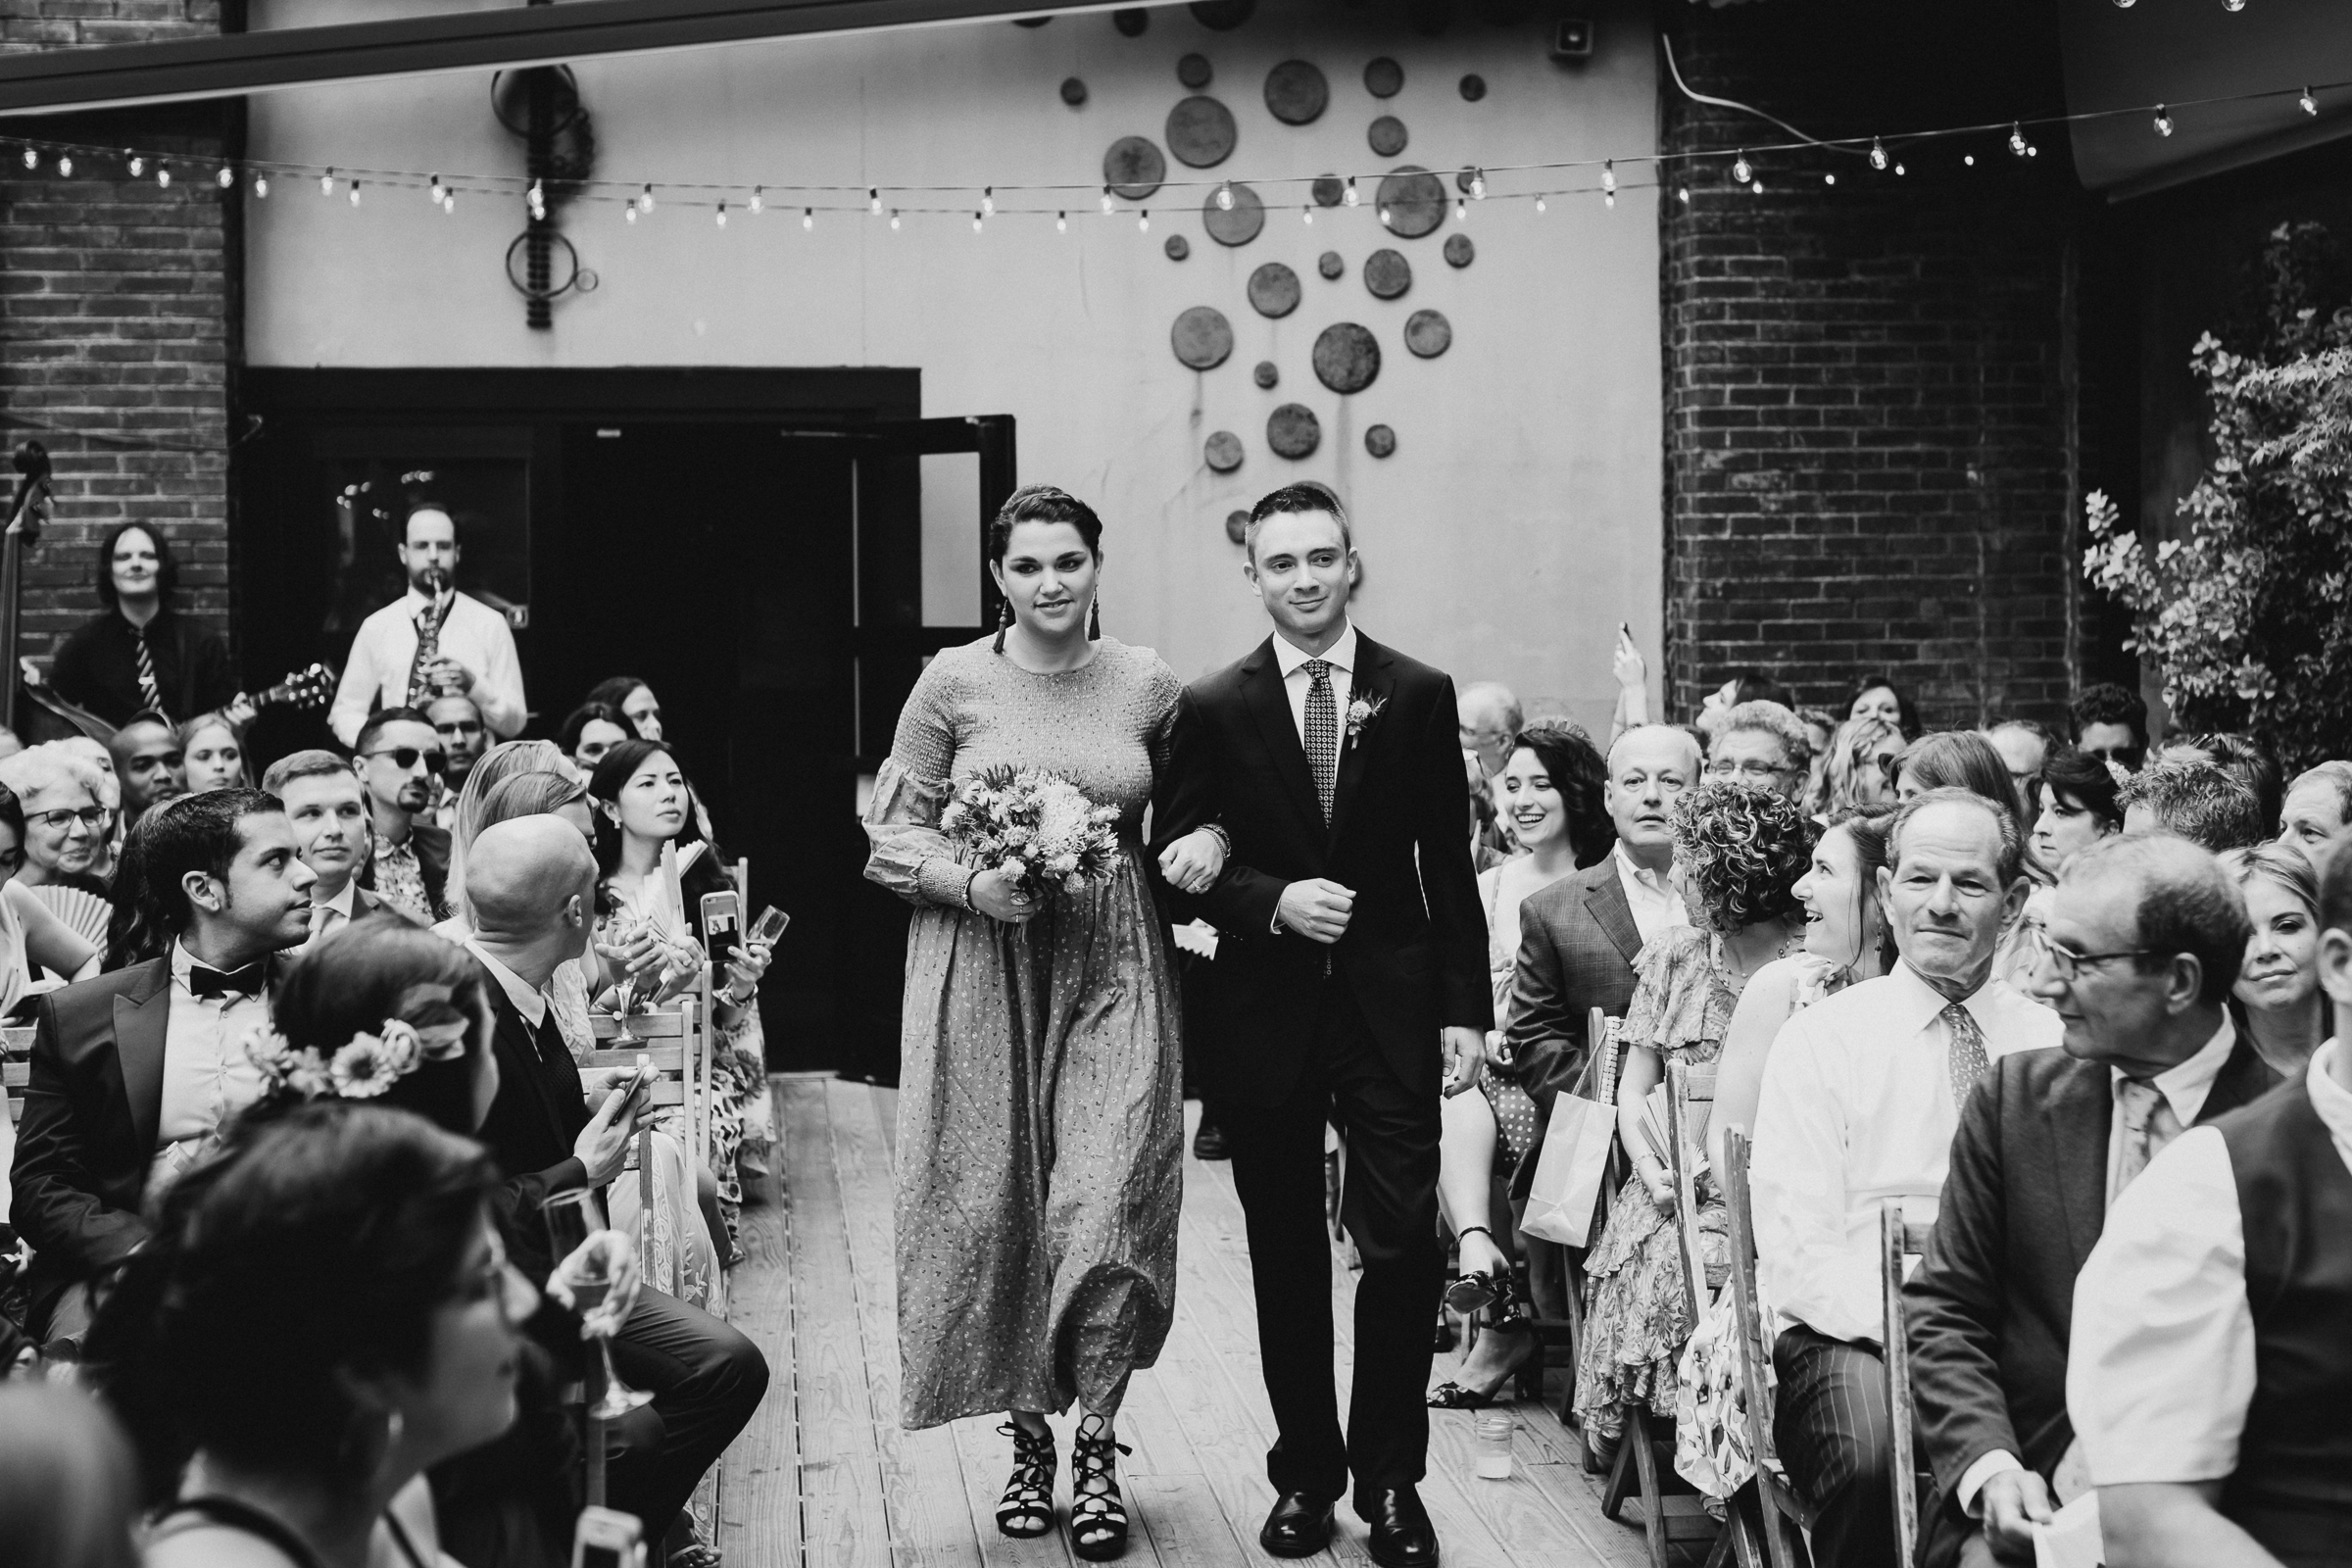 My-Moon-Brooklyn-LGBT-Gay-Documentary-Wedding-Photographer-63.jpg